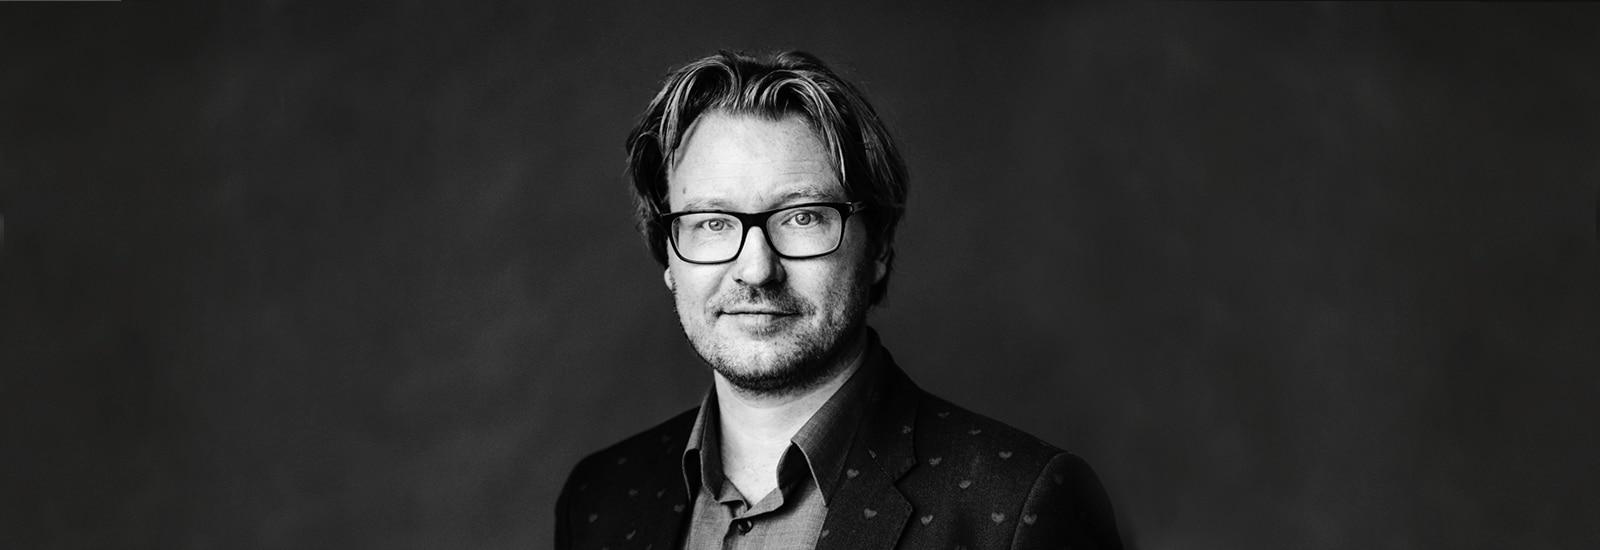 Claus Skytte Foredrag